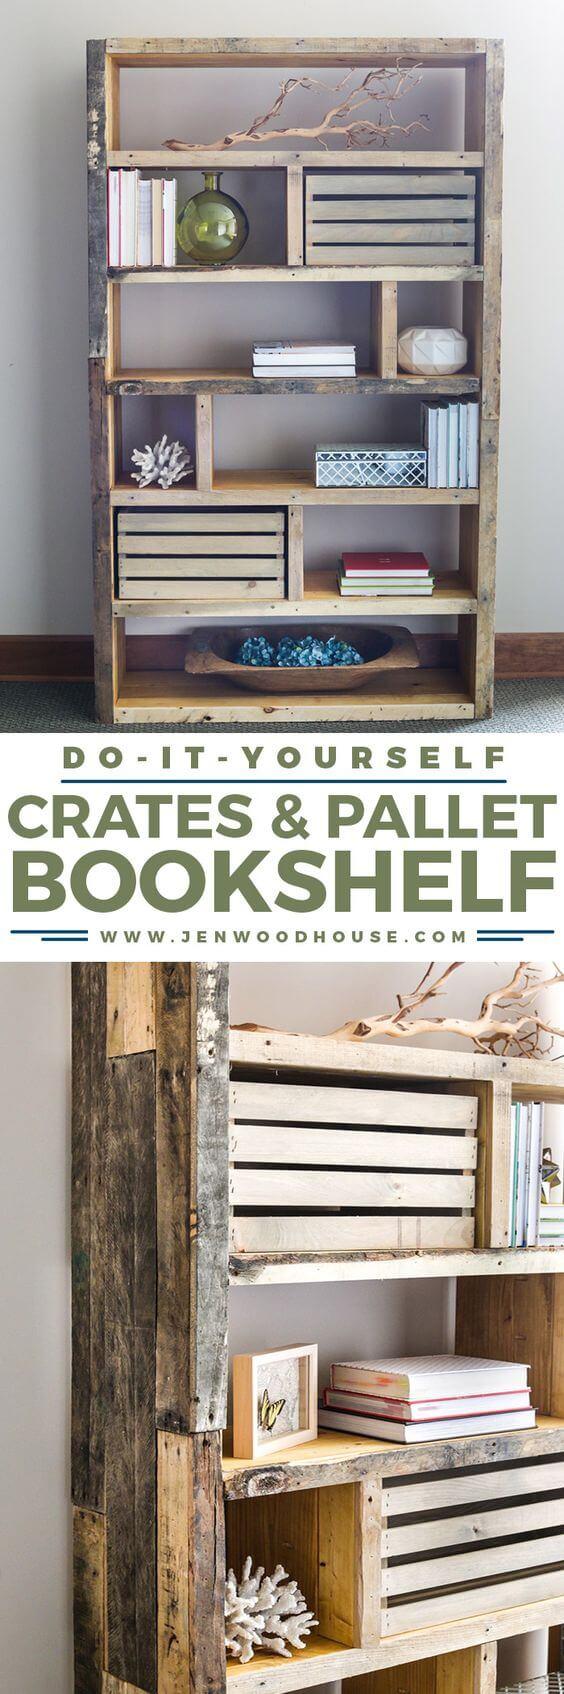 26 Best Diy Bookshelf Ideas And Designs For 2019